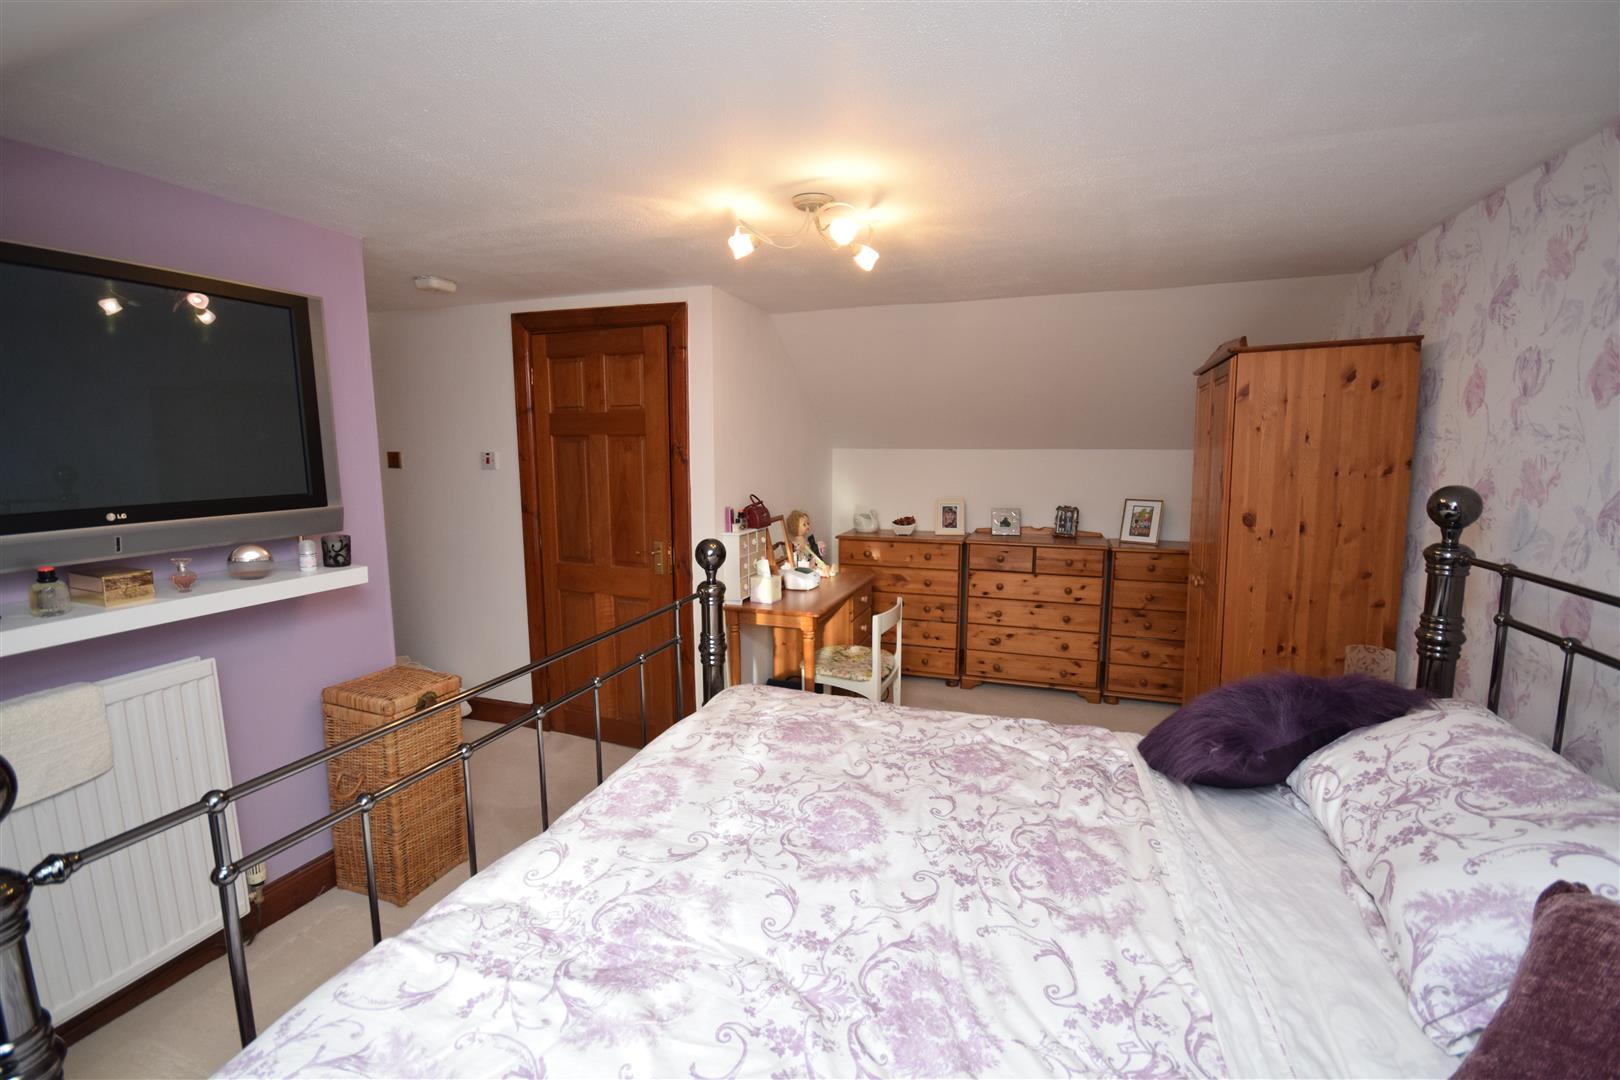 Burnside Cottage, Hatton Road, Rattray, Blairgowrie, Perthshire, PH10 7HZ, UK